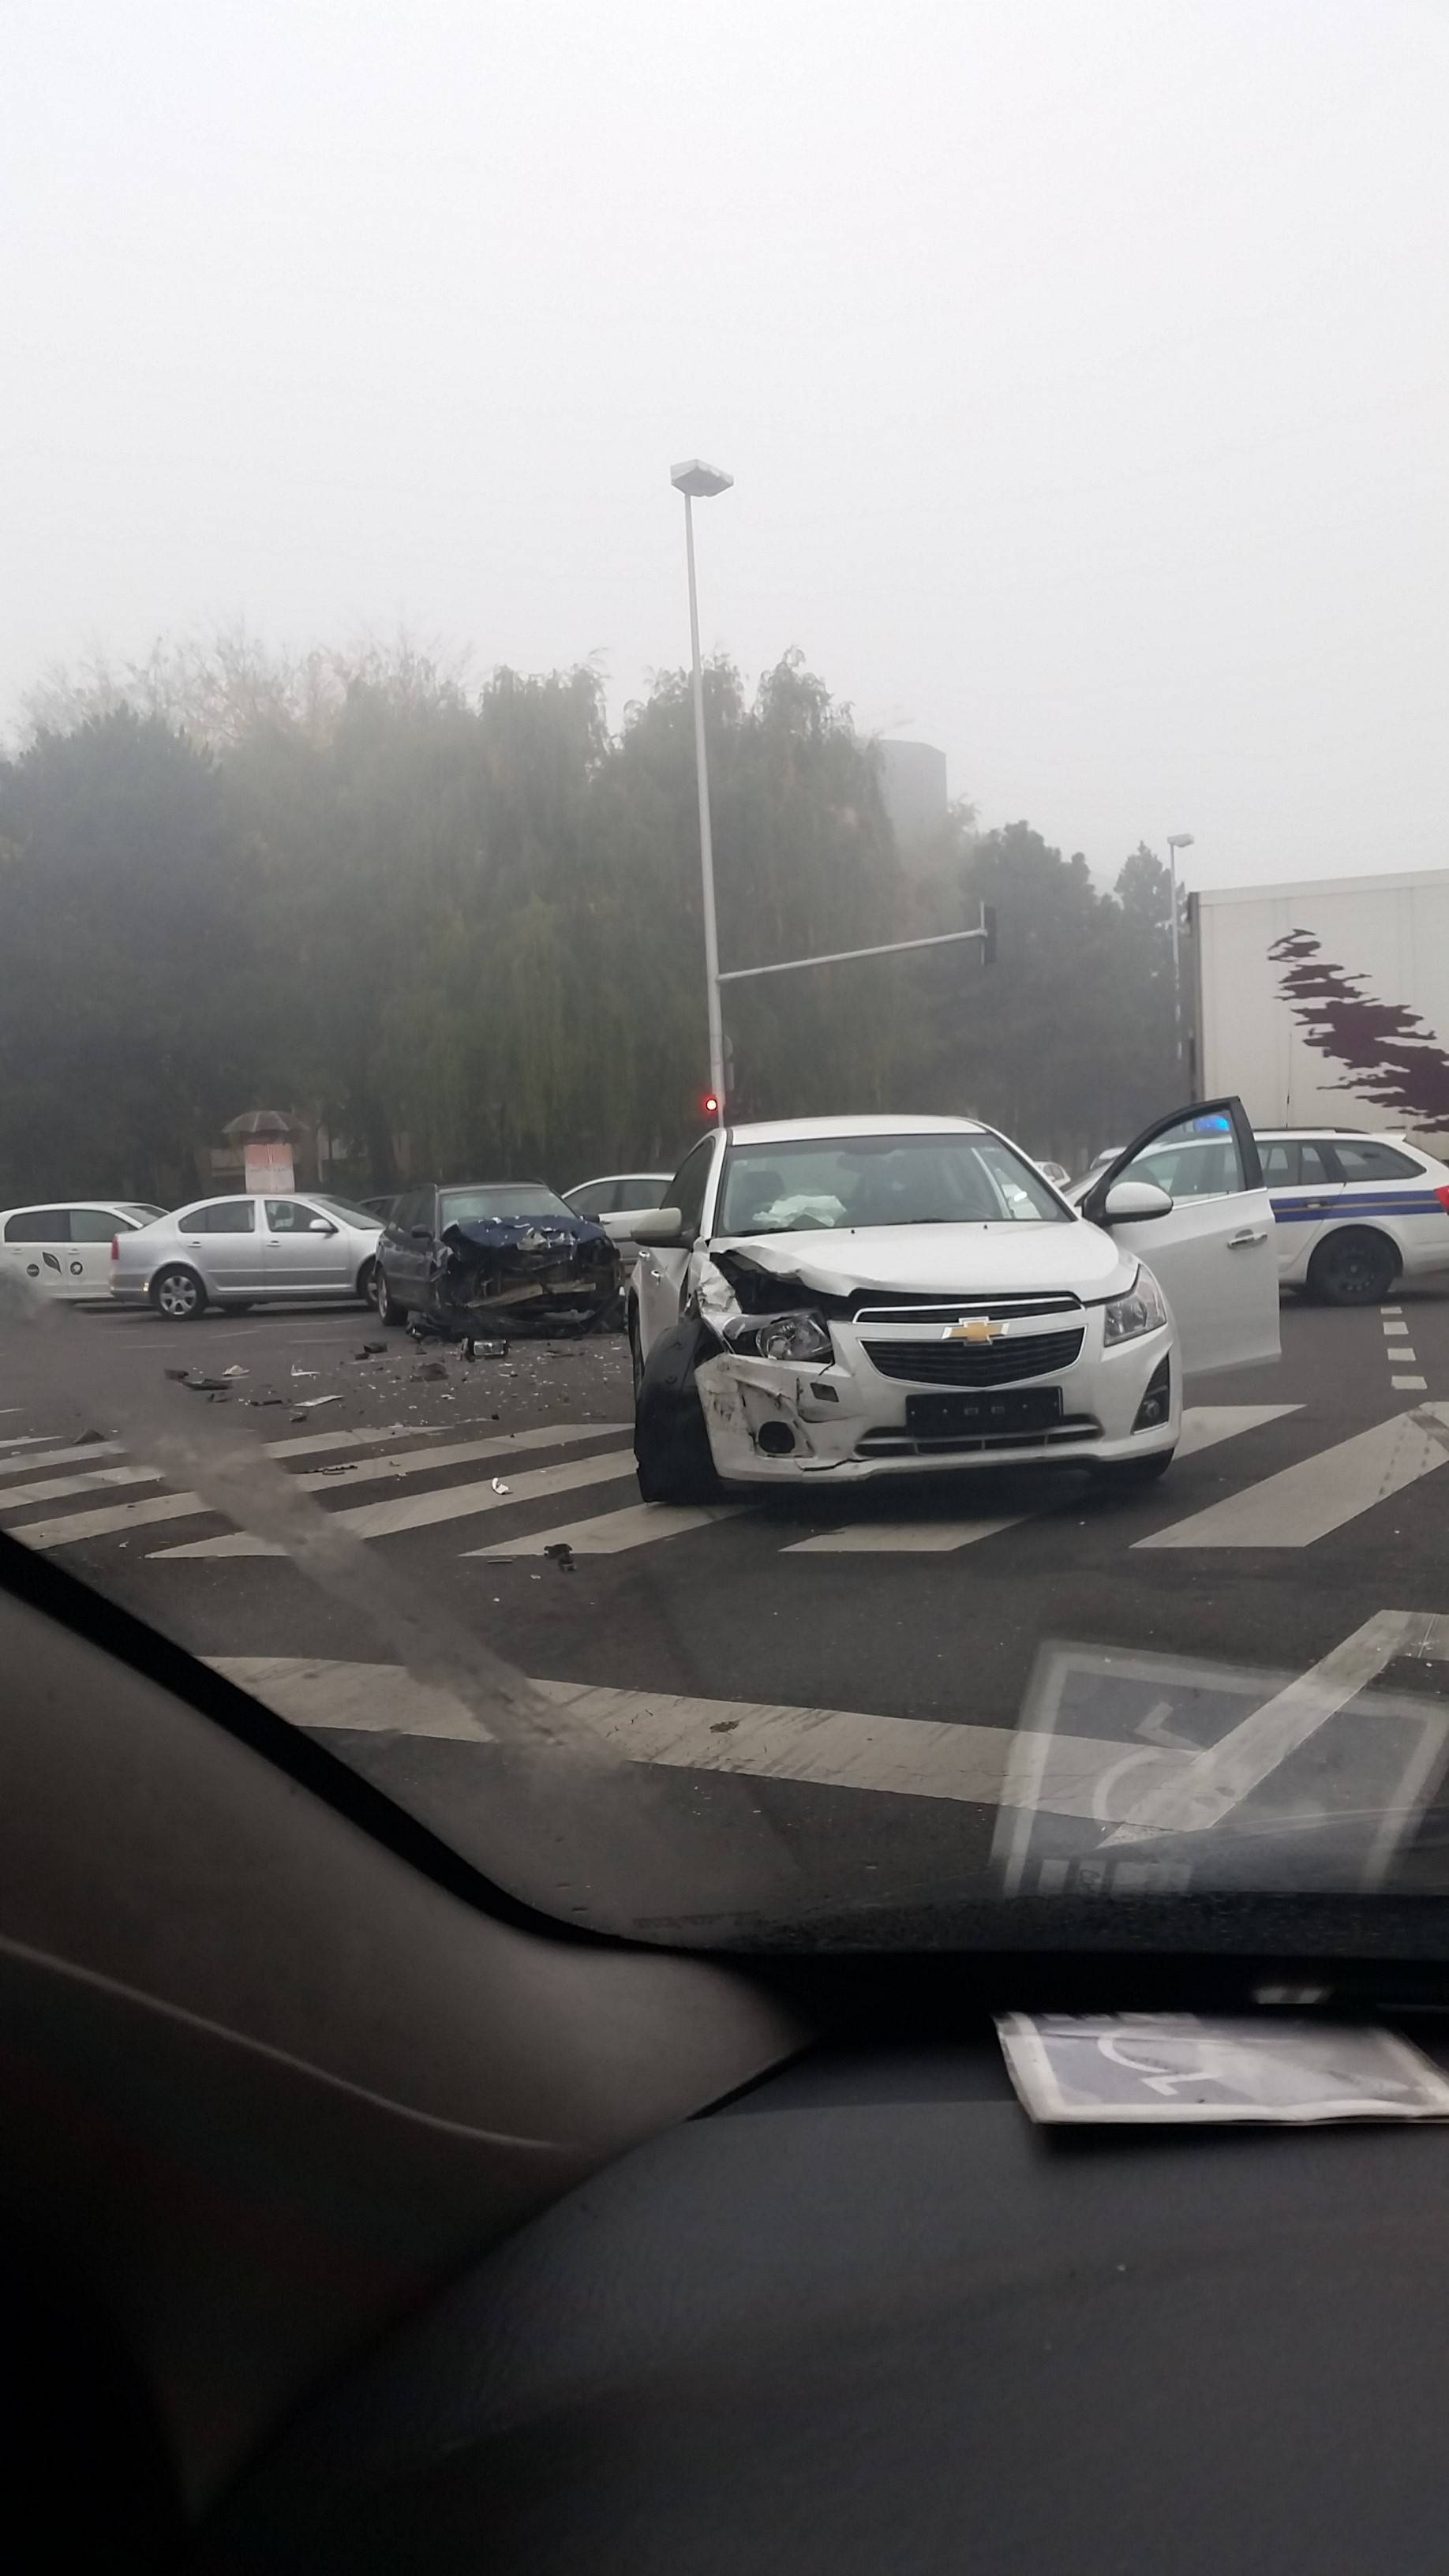 Sudar Audija i Chevroleta u Zagrebu: Jedan vozač u bolnici